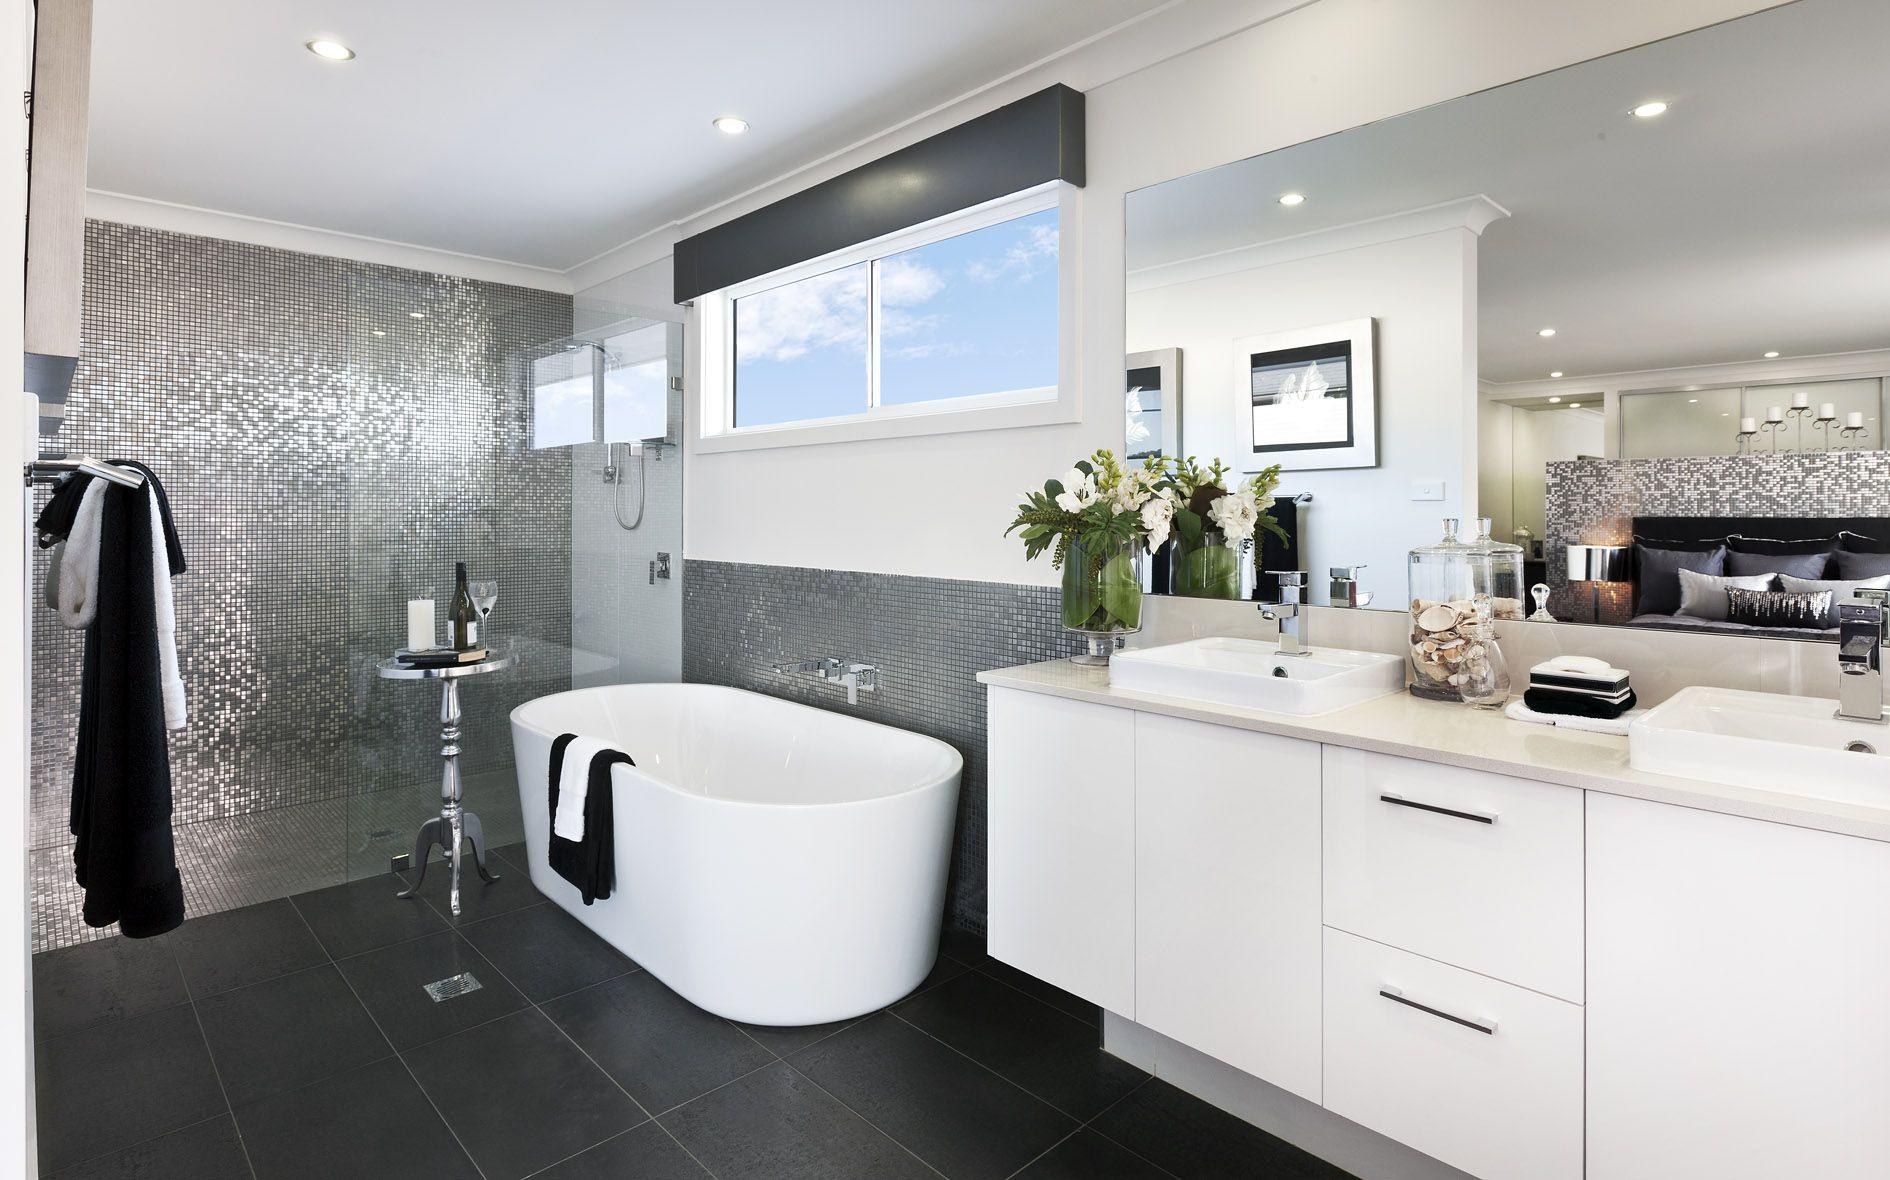 Bathroom Renovations Sunbury merlot elite with timeless façade on display at homeworld 5